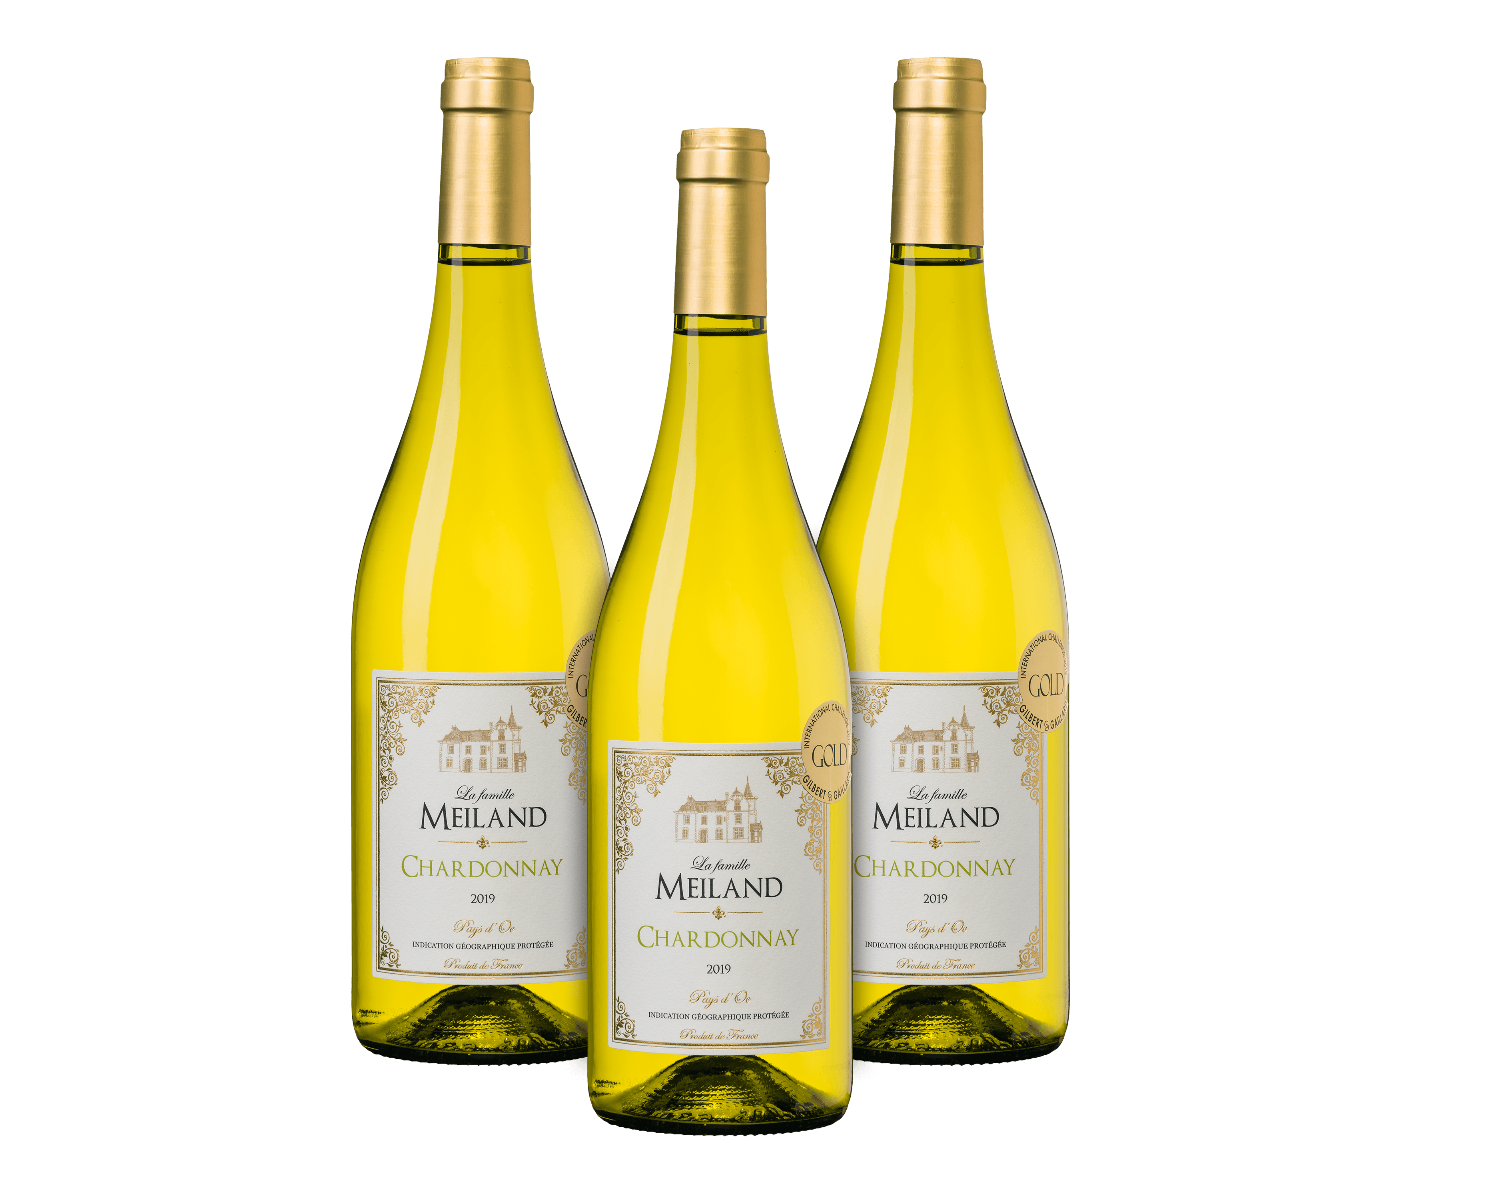 La famille Meiland Chardonnay (3 flessen)